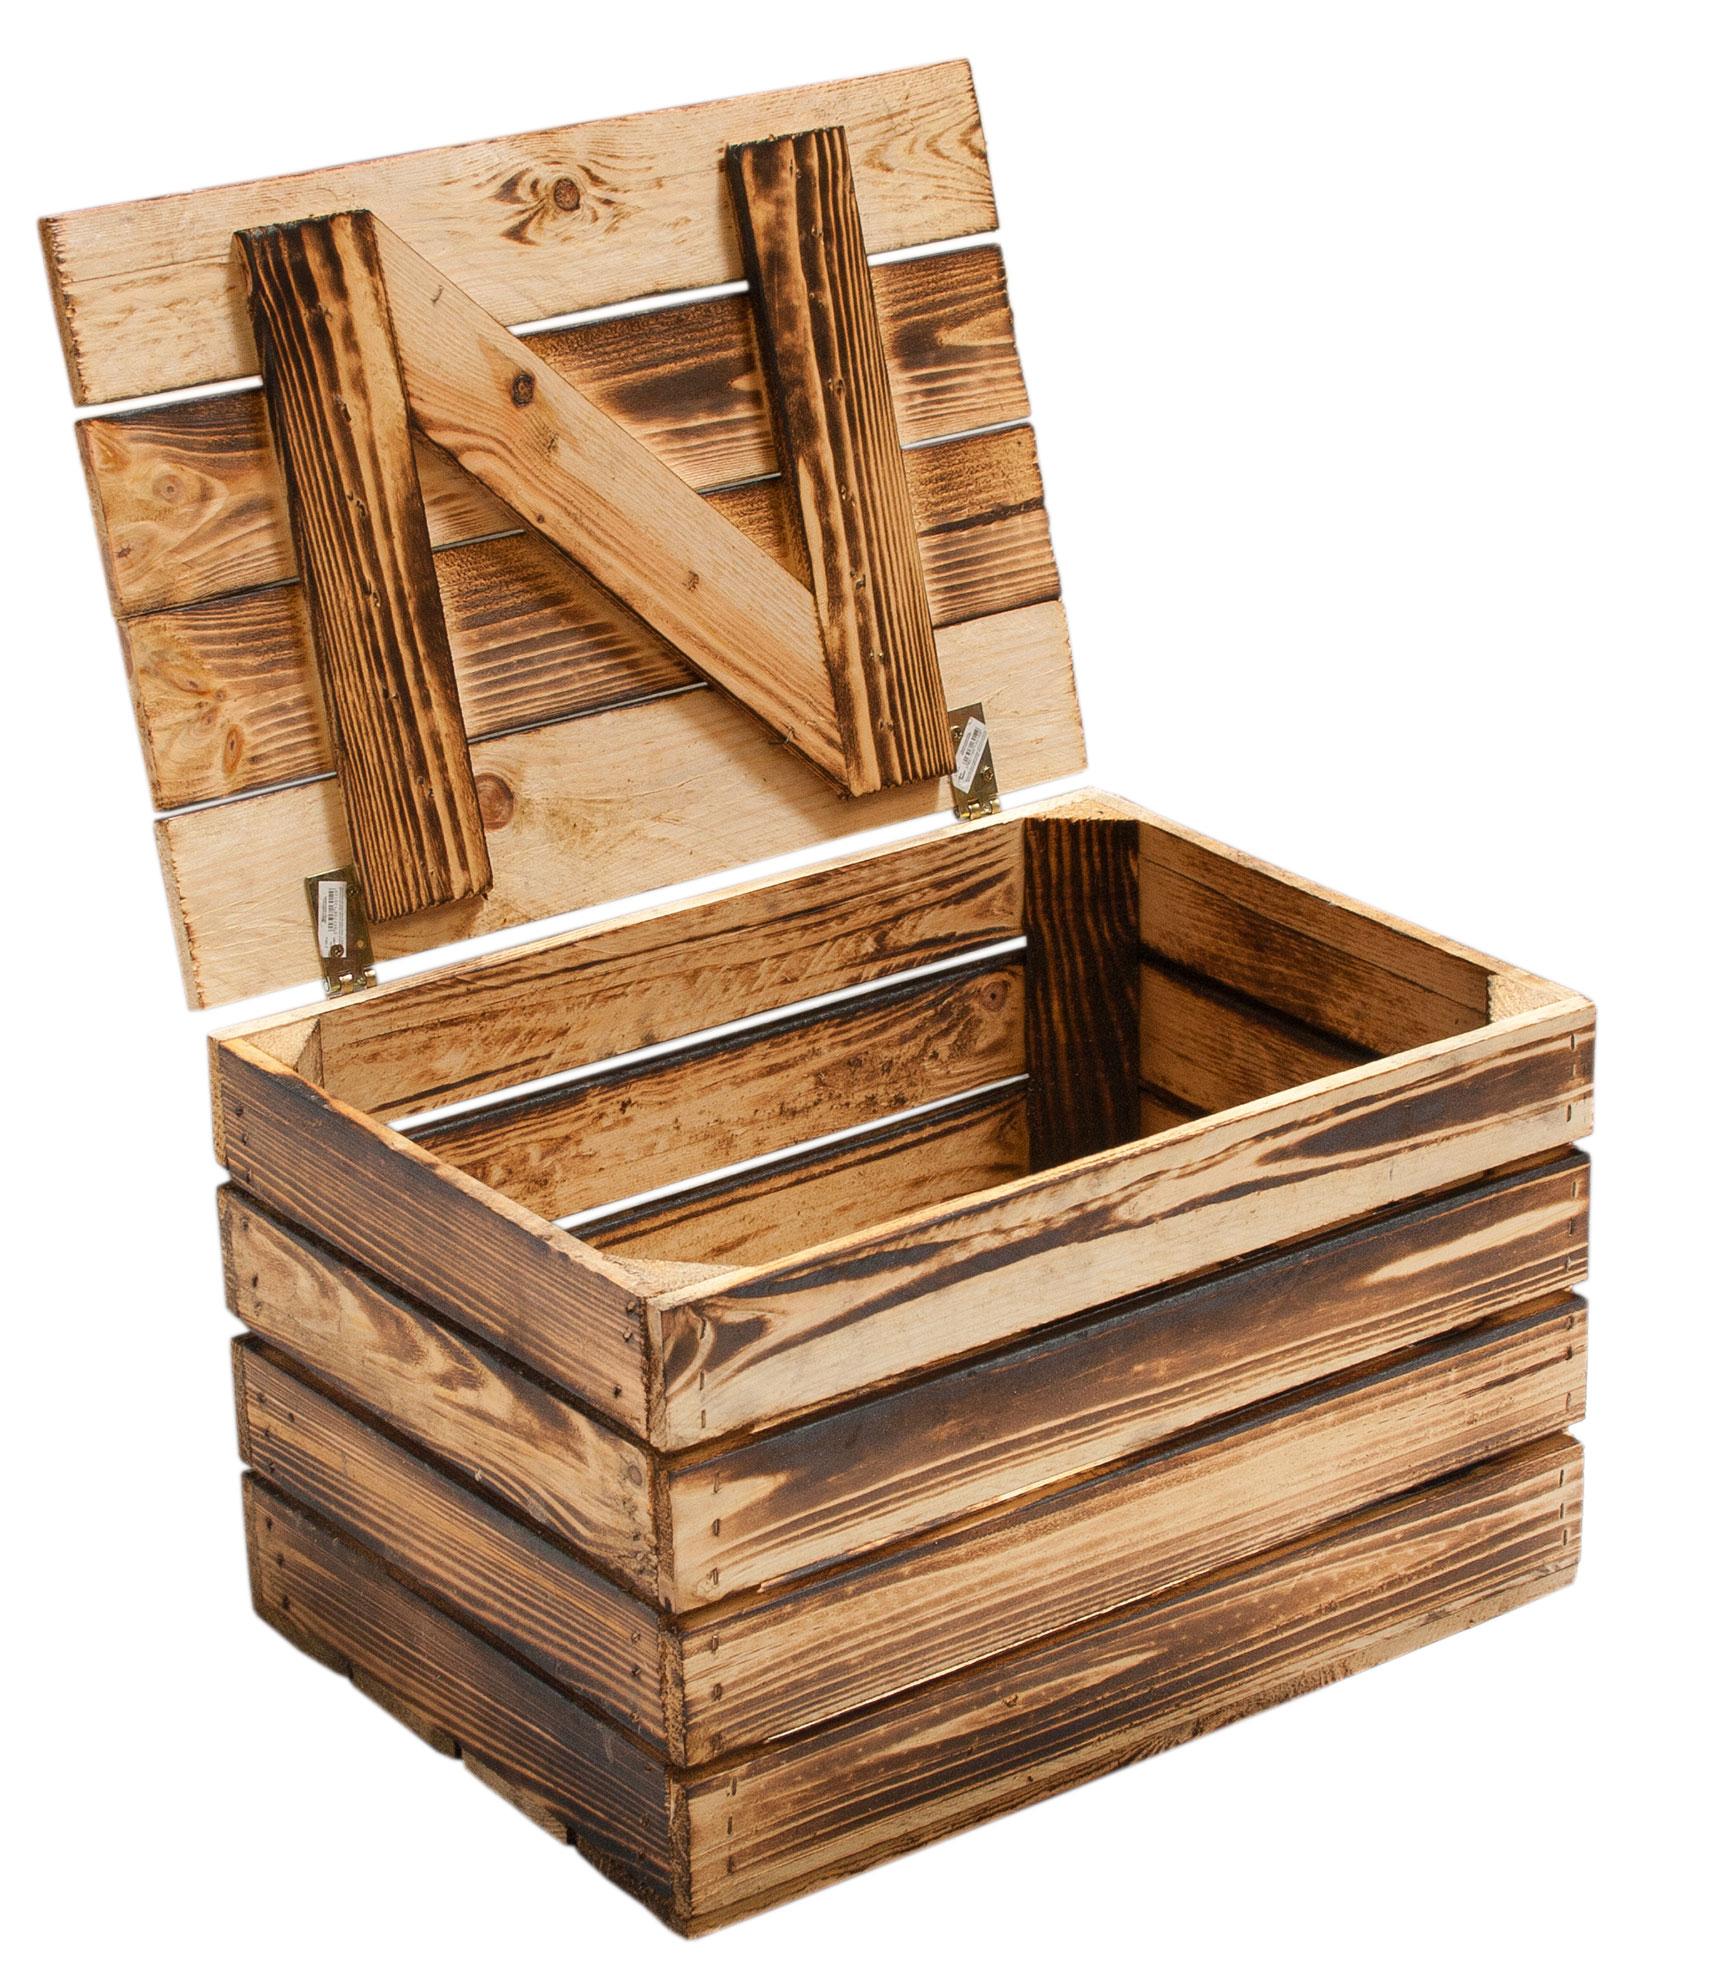 m bel truhen neue holztruhe geflammt klein 50x36x31cm. Black Bedroom Furniture Sets. Home Design Ideas